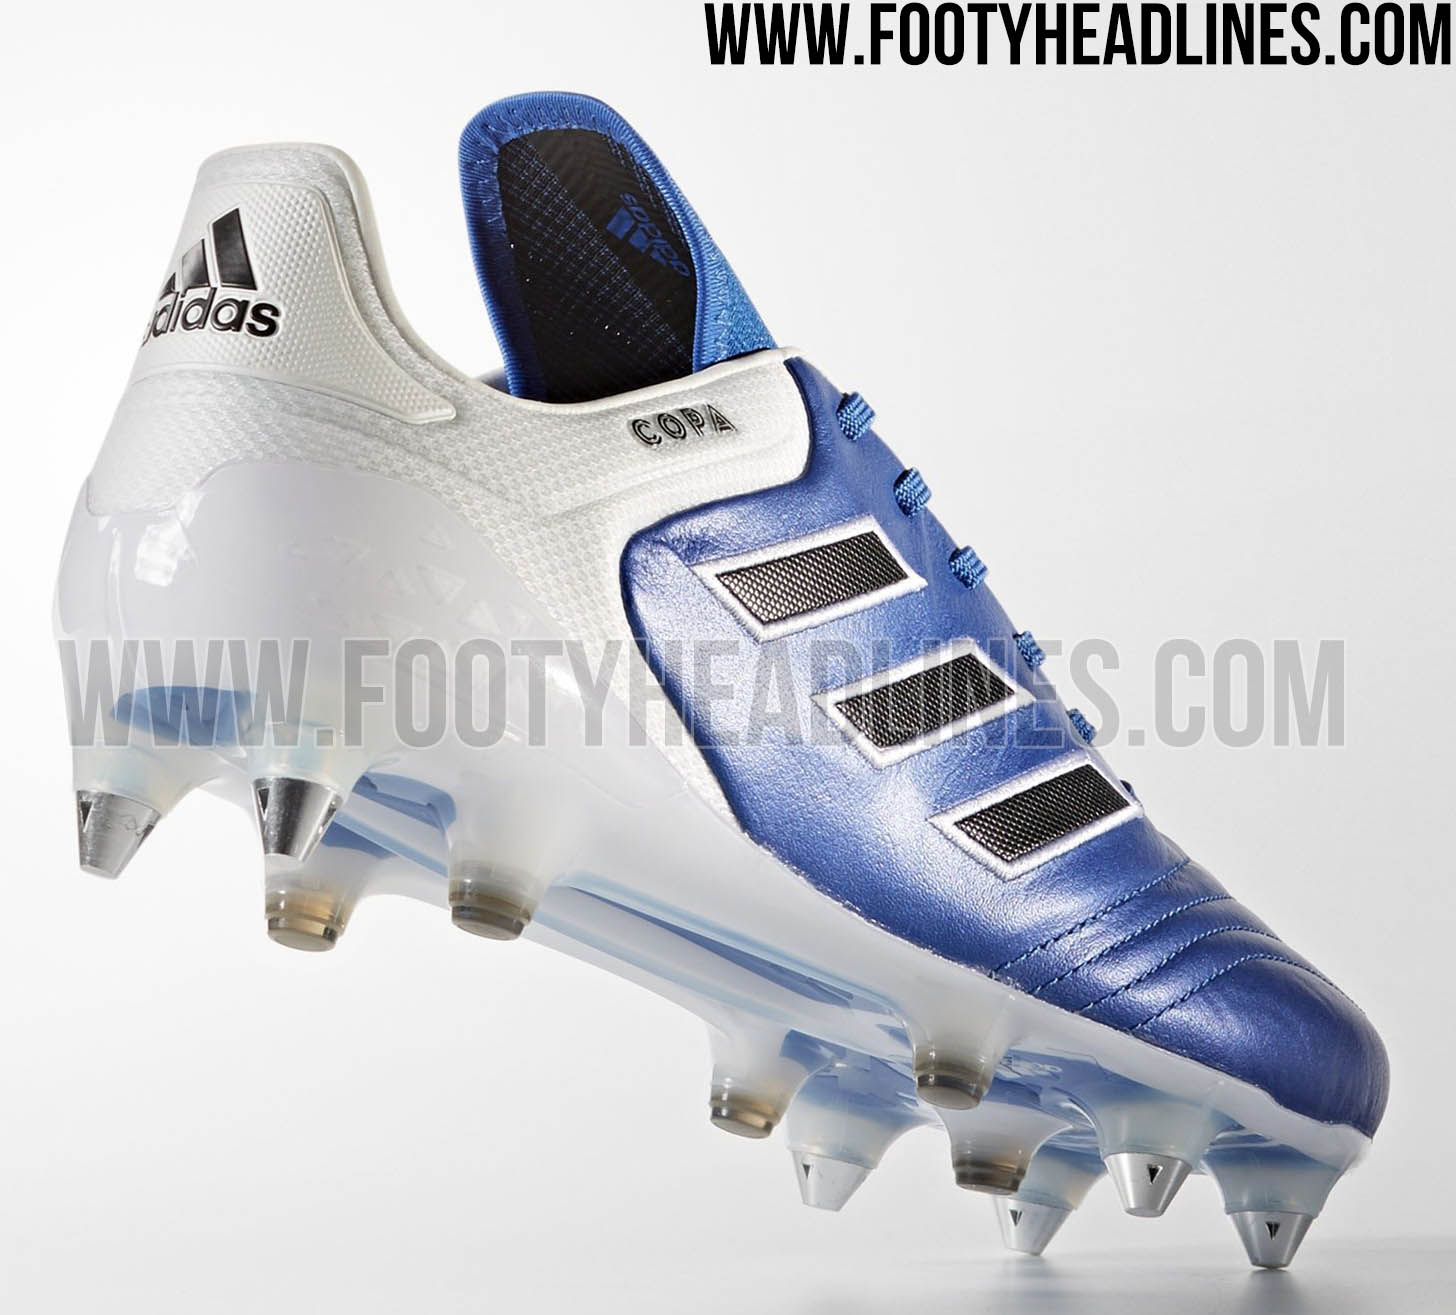 best service 7f976 11ab2 blue adidas boots